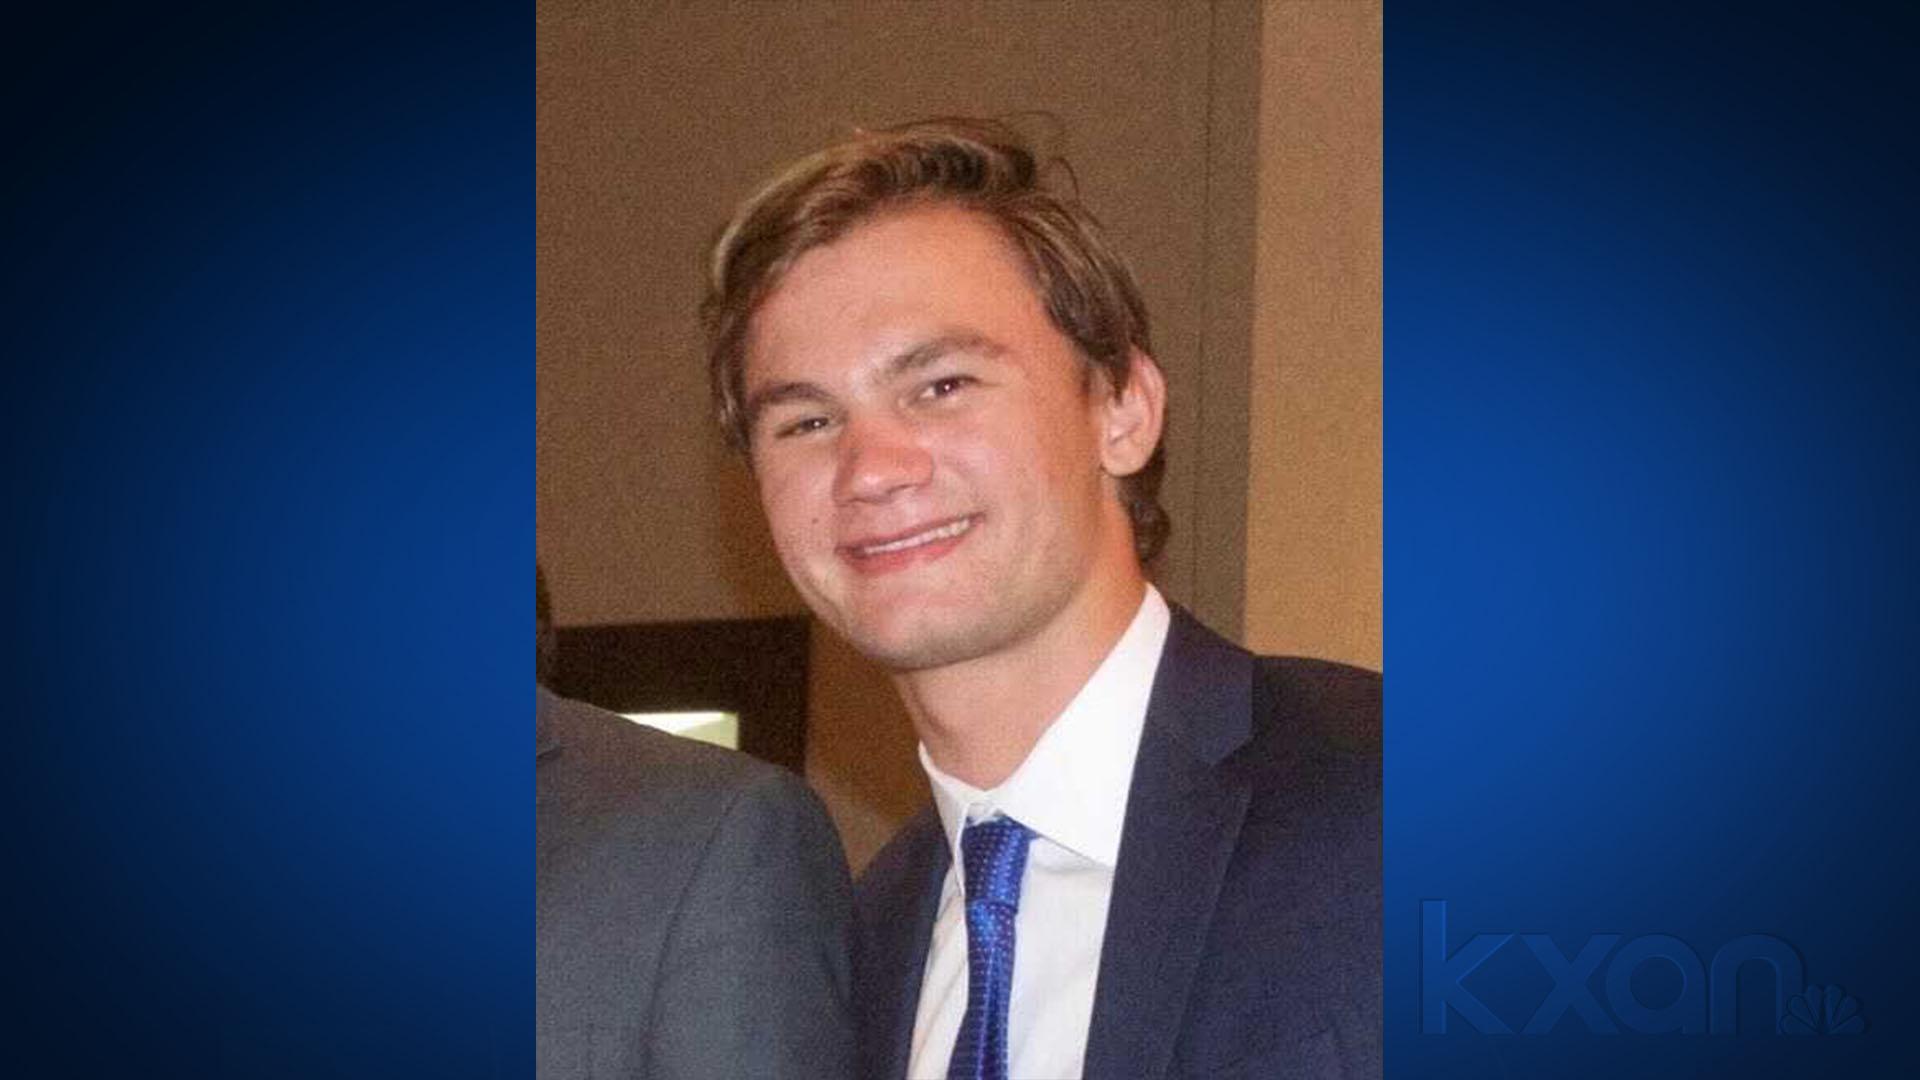 Texas State University student Jason Landry